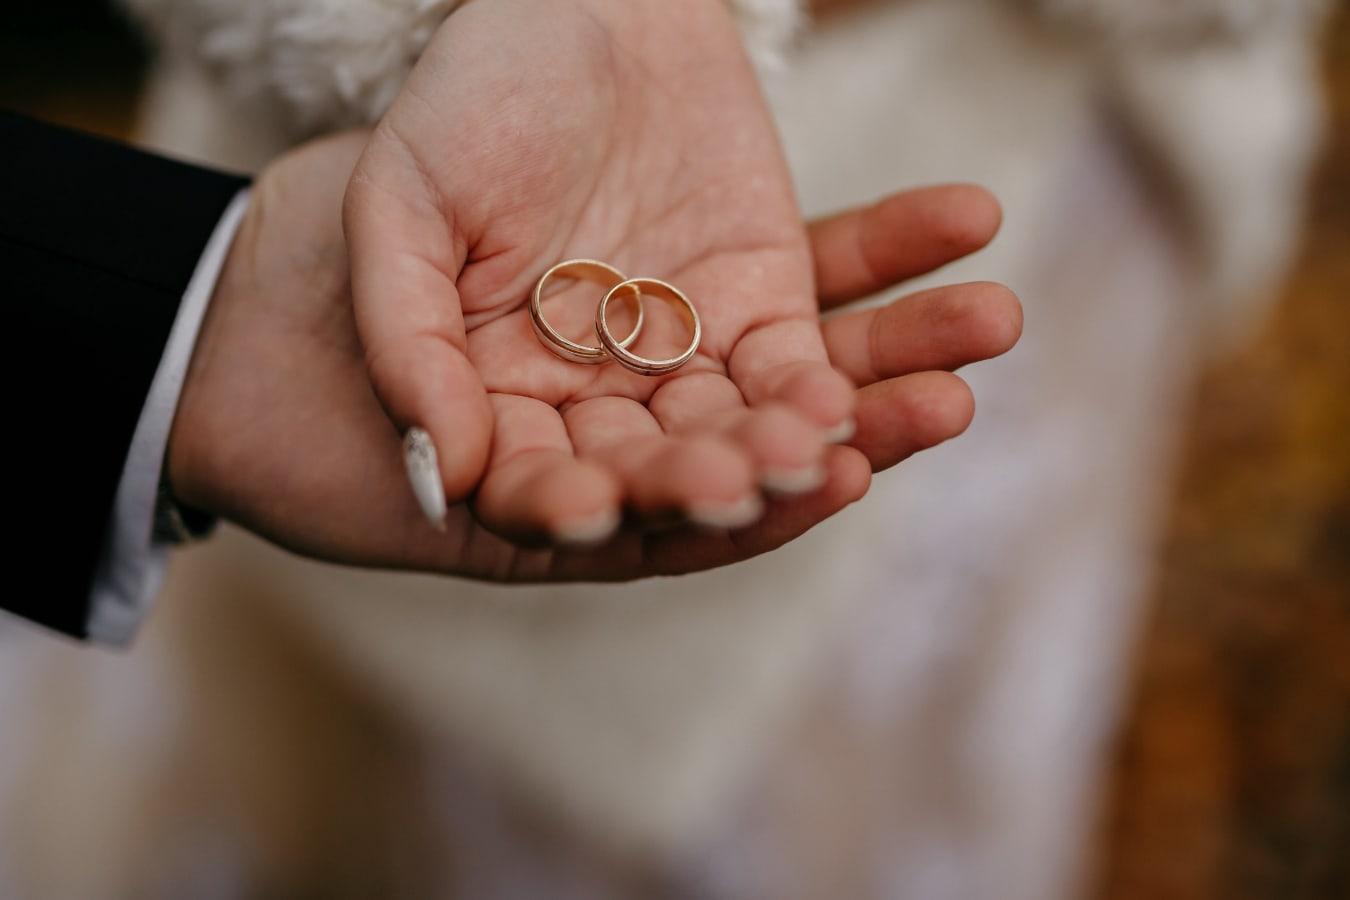 man, holding, woman, hands, gold, wedding ring, hand, skin, finger, wedding